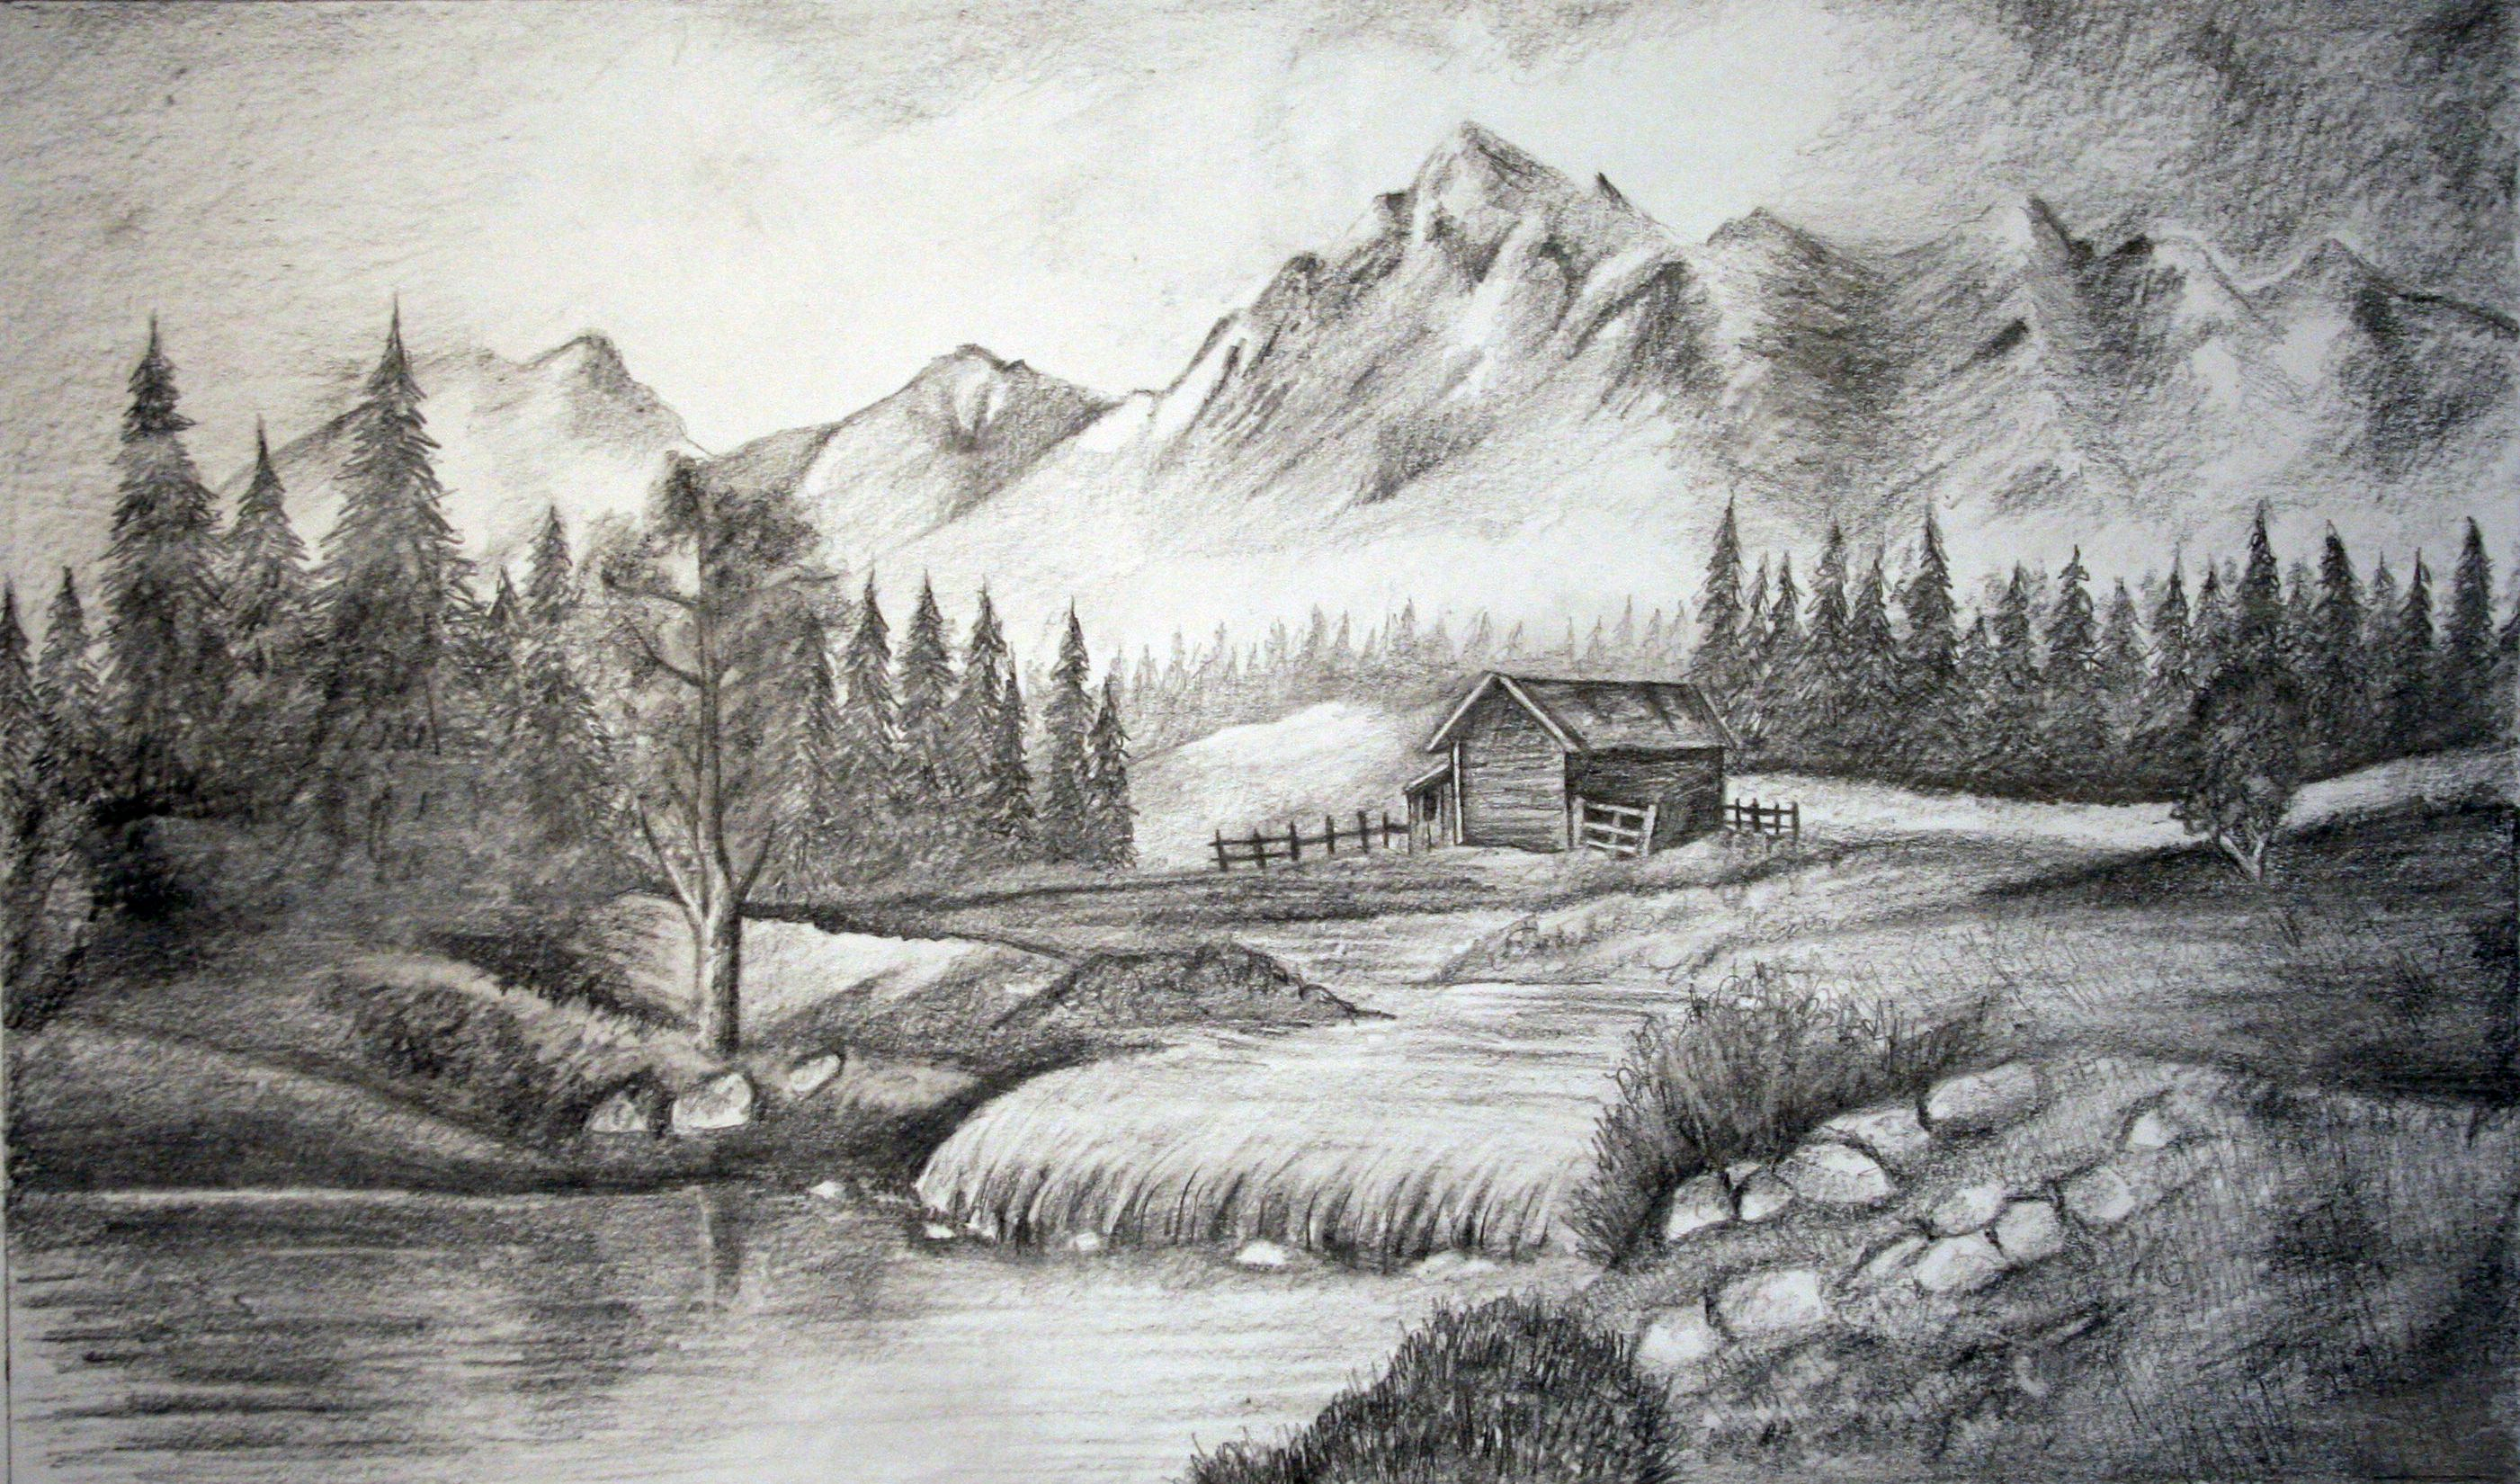 Landscape In Pencil Pencil Sketches Landscape Landscape Drawings Mountain Sketch